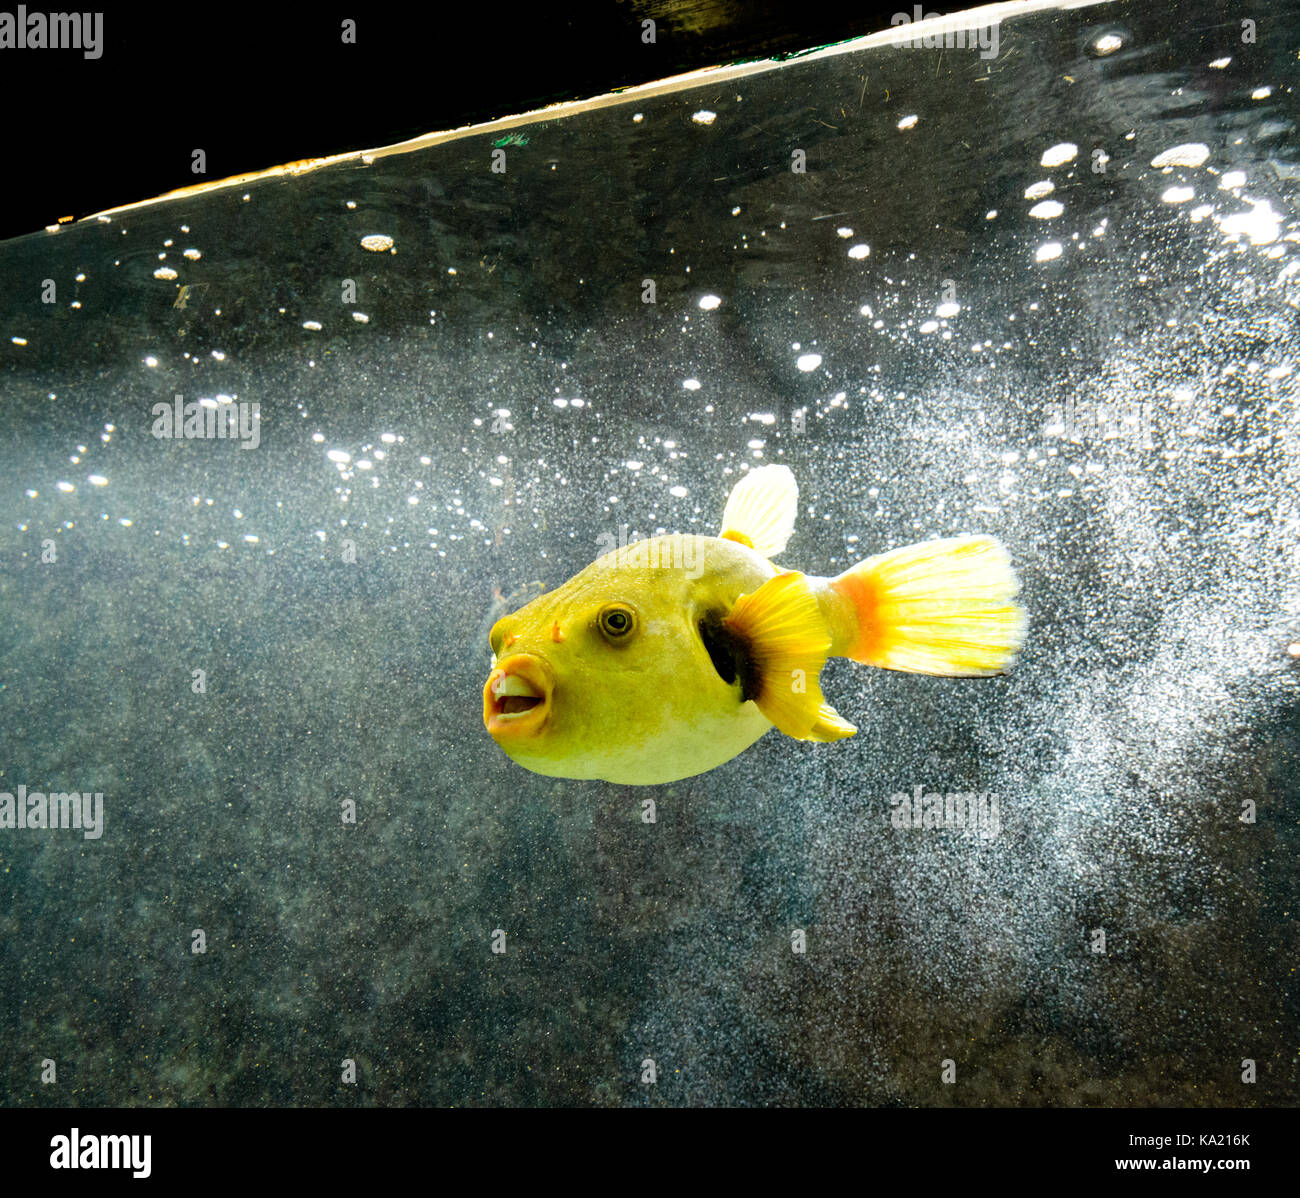 Exotic marine animals stock photos exotic marine animals for Are fish considered animals